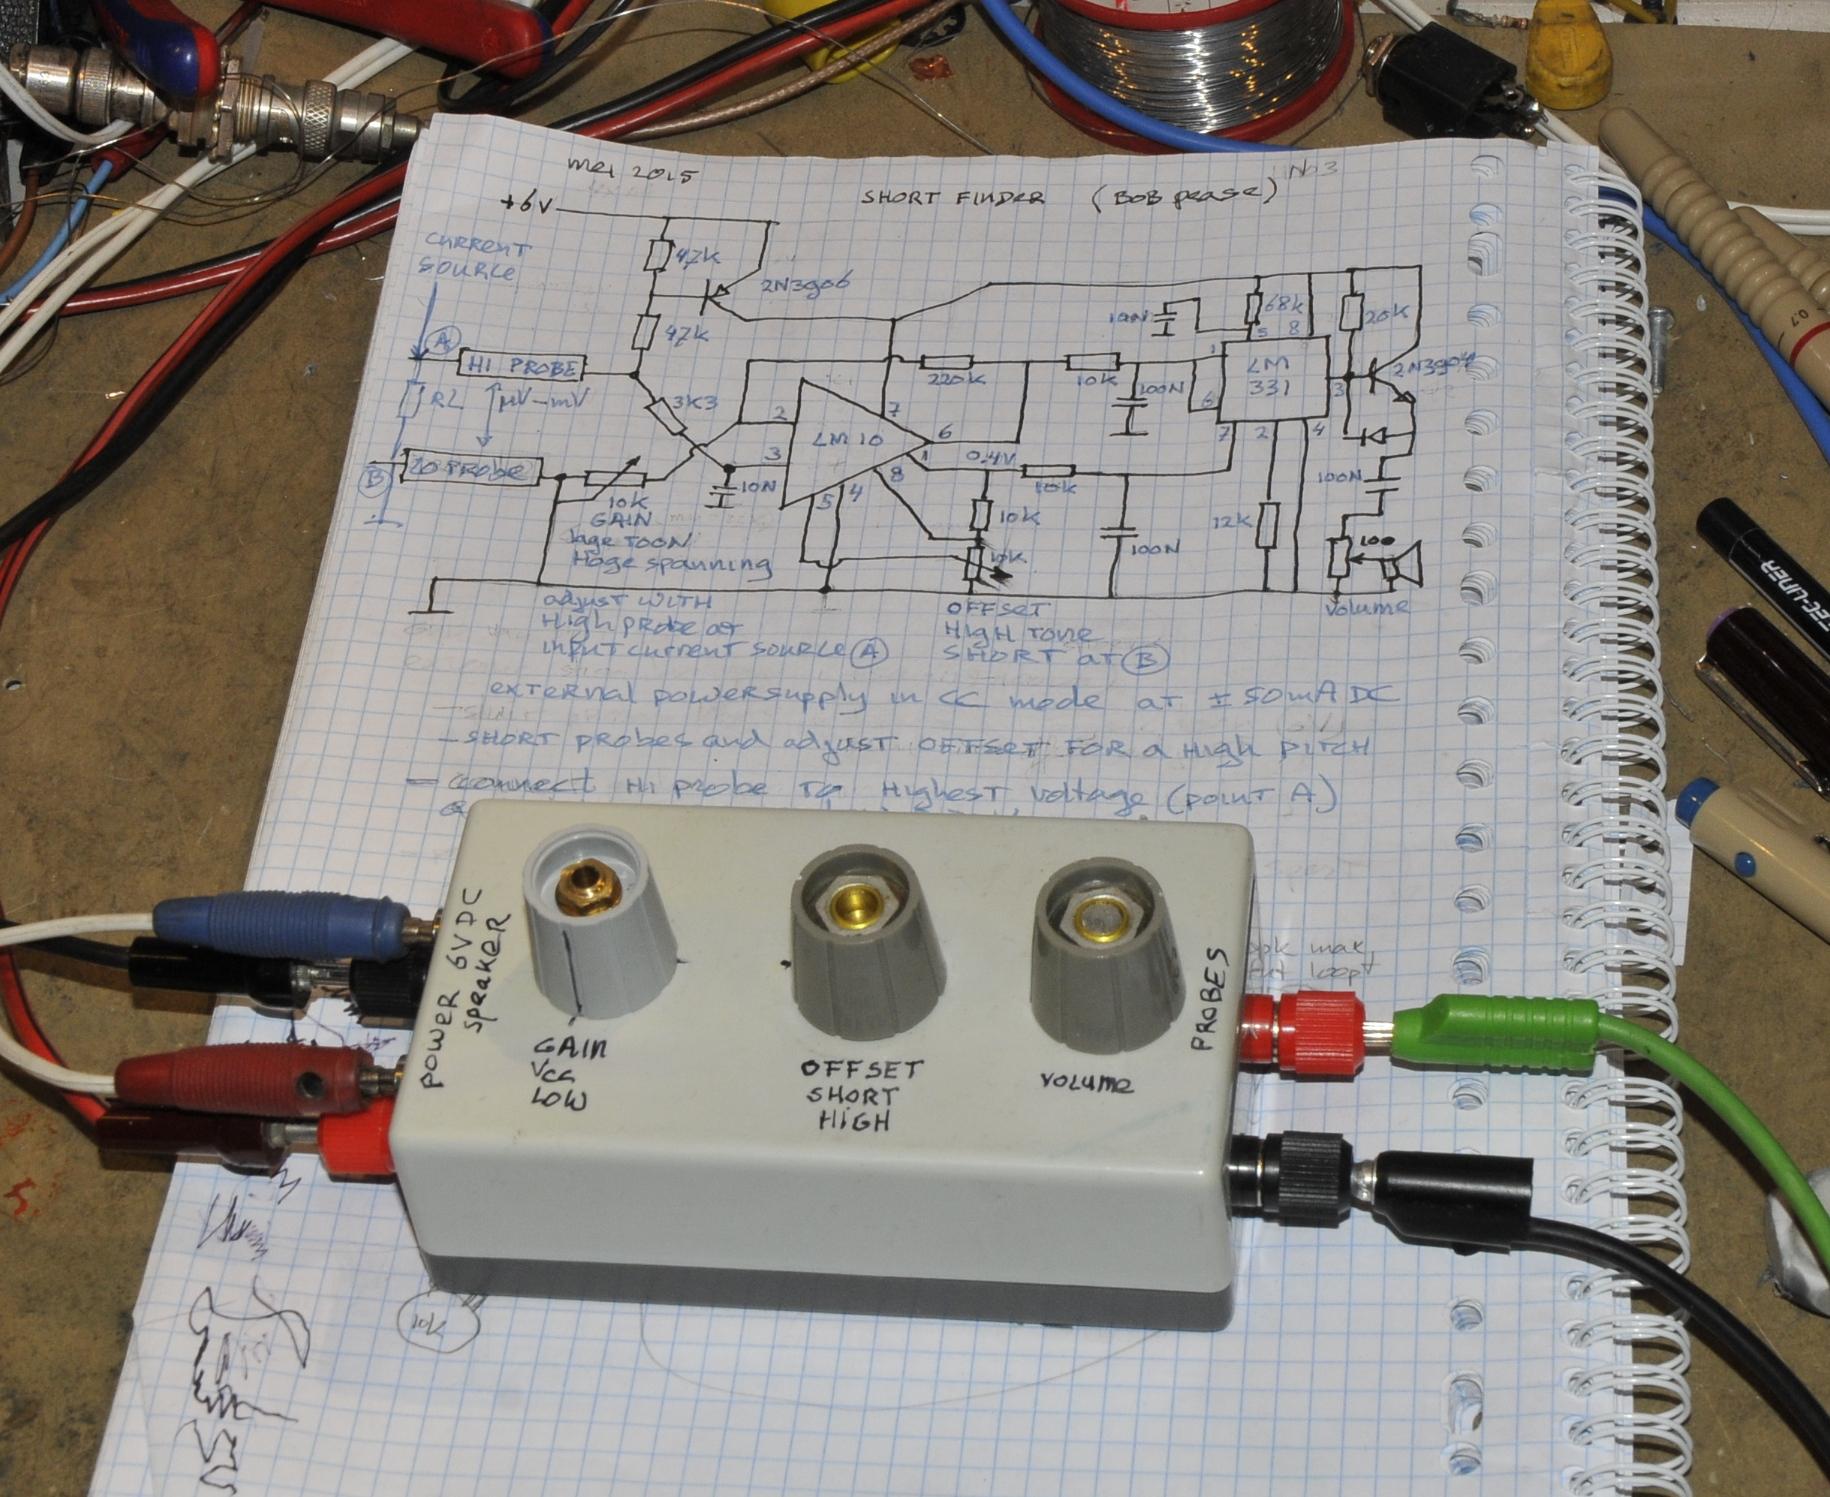 Short Circuits Finding Pa4tims Opvangtehuis Voor Buizenbakken Simple Signal Generator For Tracing Circuit Diagram Bob Pease